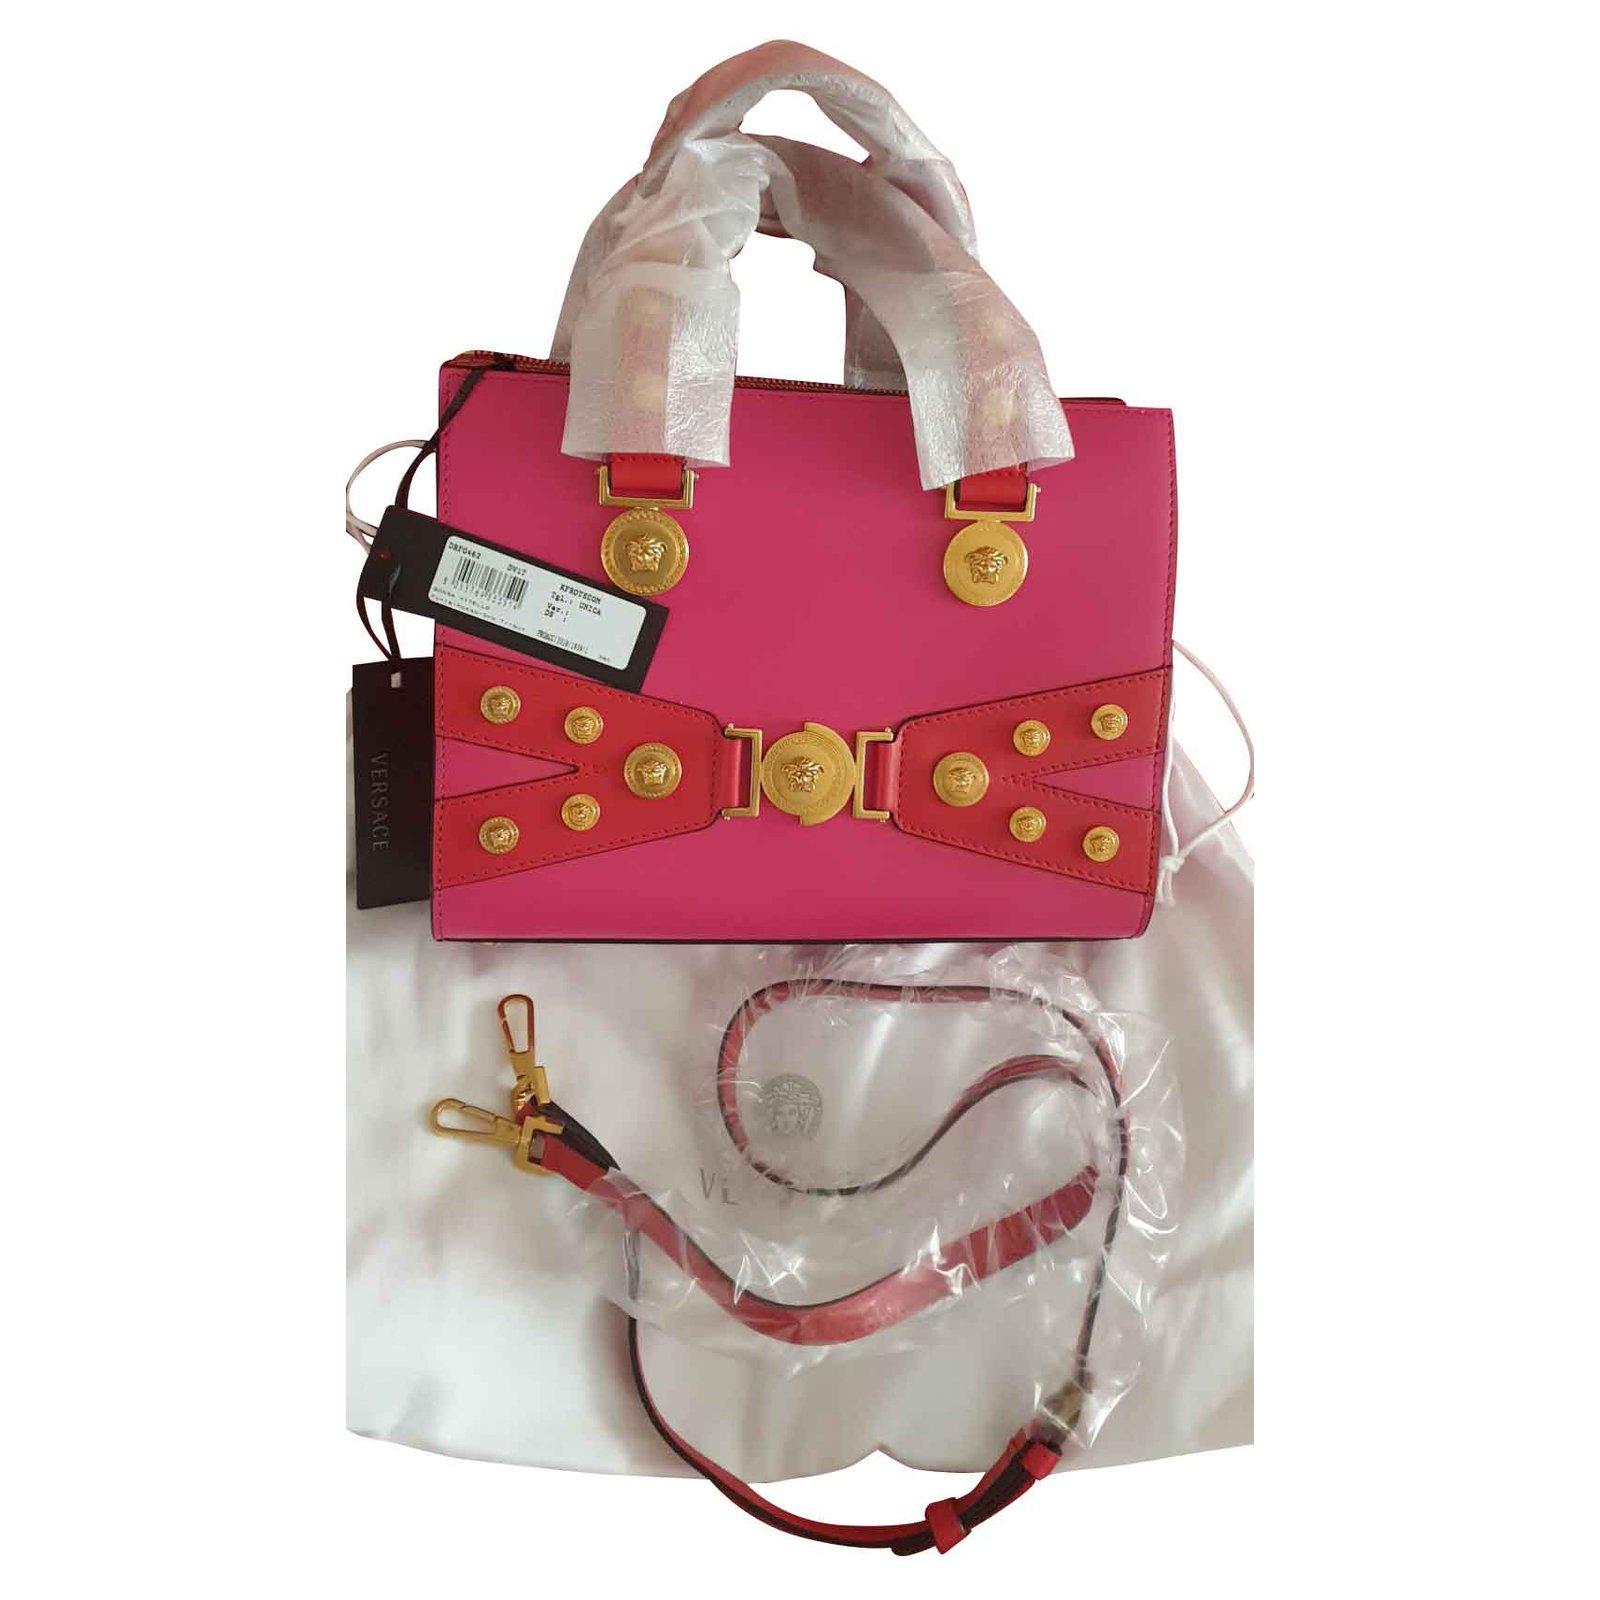 90d3cd5549a7 Versace Medusa Stud Tribute Tote in Pink Handbags Leather Pink ref.105544 -  Joli Closet